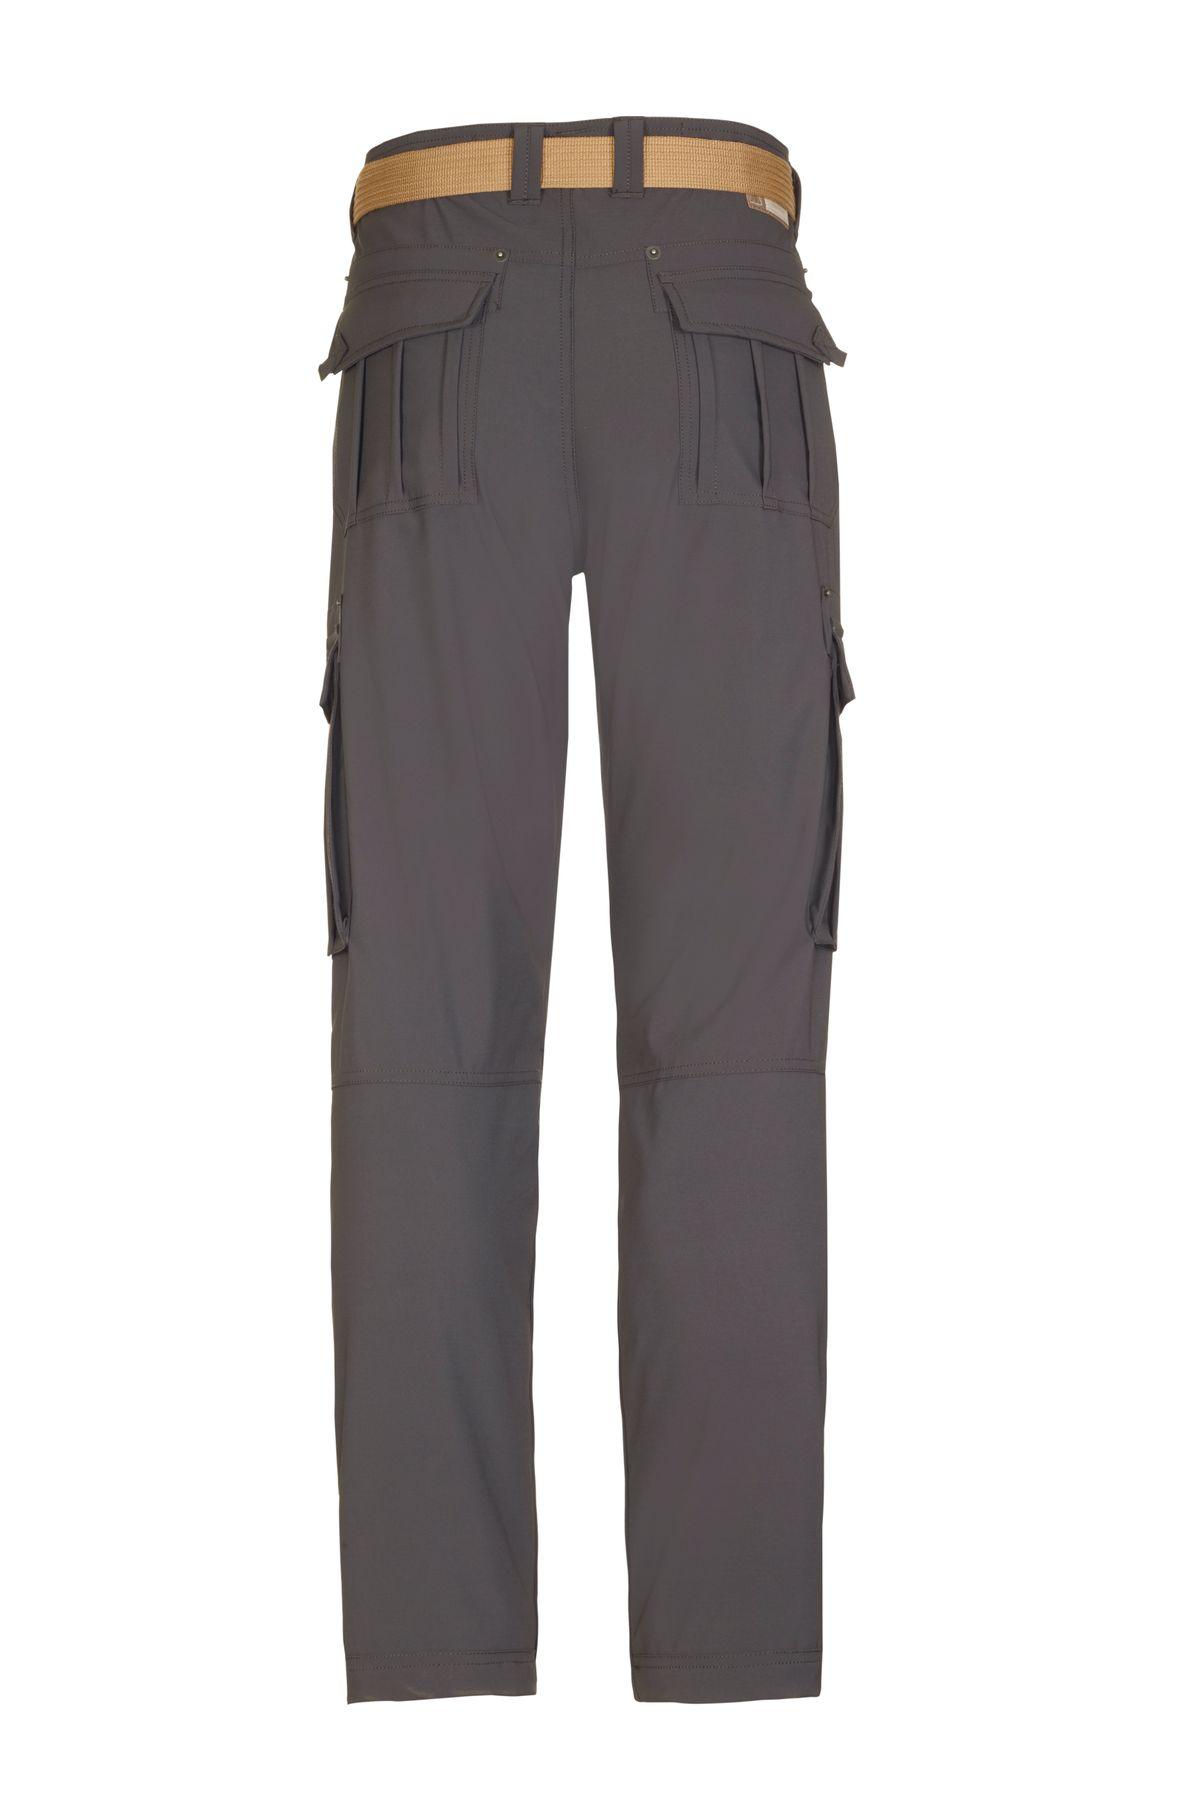 G.I.G.A DX - Casual Hose mit Gürtel, Geos (31030) – Bild 6